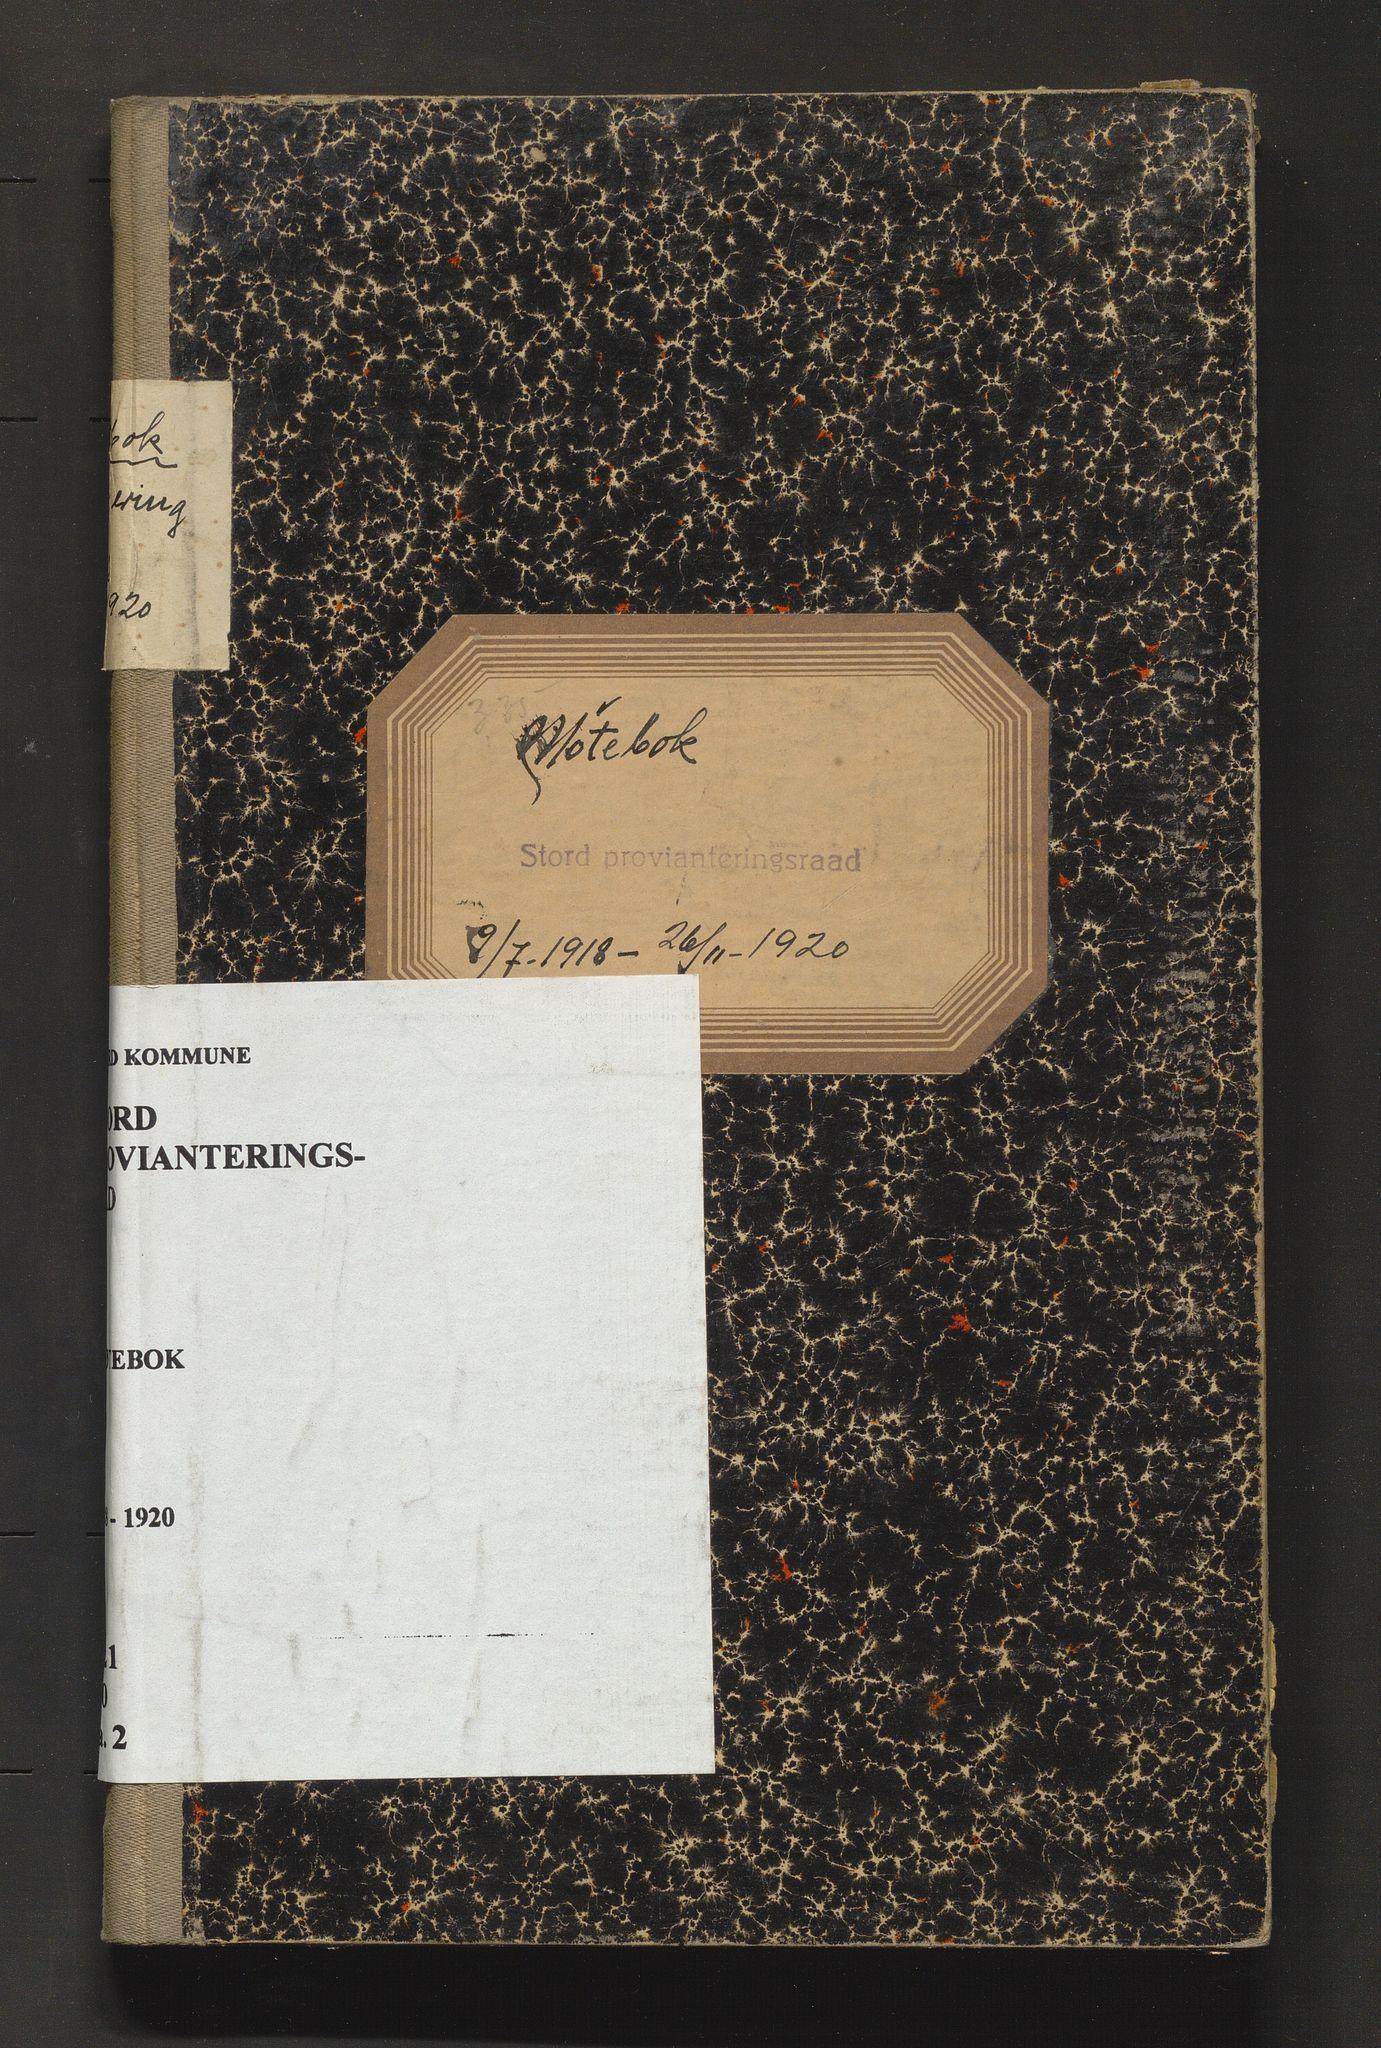 IKAH, Stord kommune. Provianteringsrådet, A/Aa/L0002: Møtebok for Stord provianteringsråd, 1918-1920